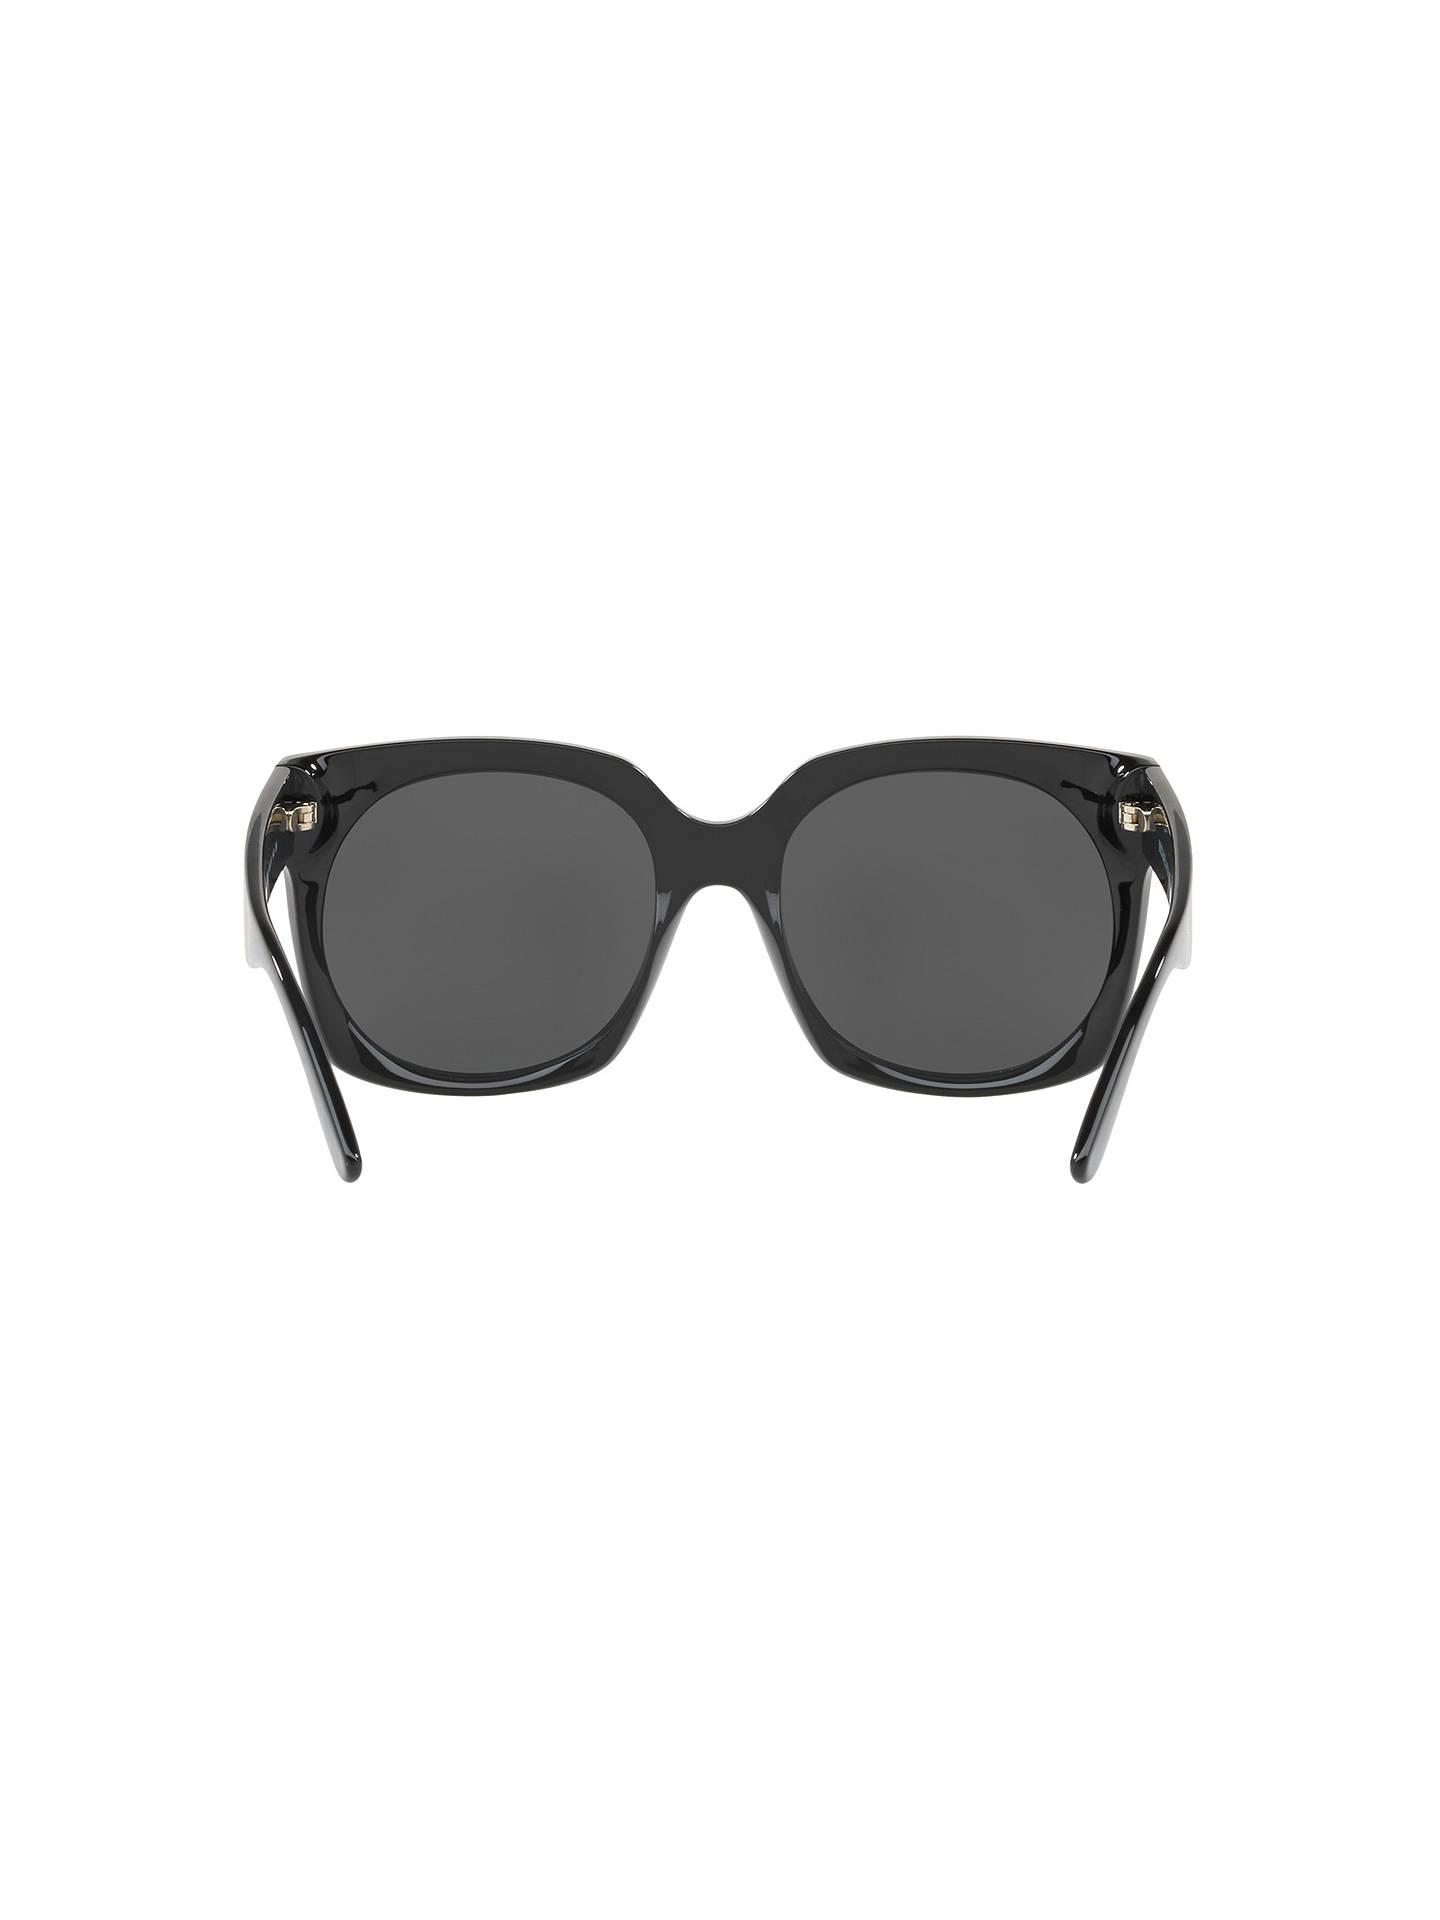 397ce75d28641 ... Buy Michael Kors MK2067 Women s Destin Studded Square Sunglasses